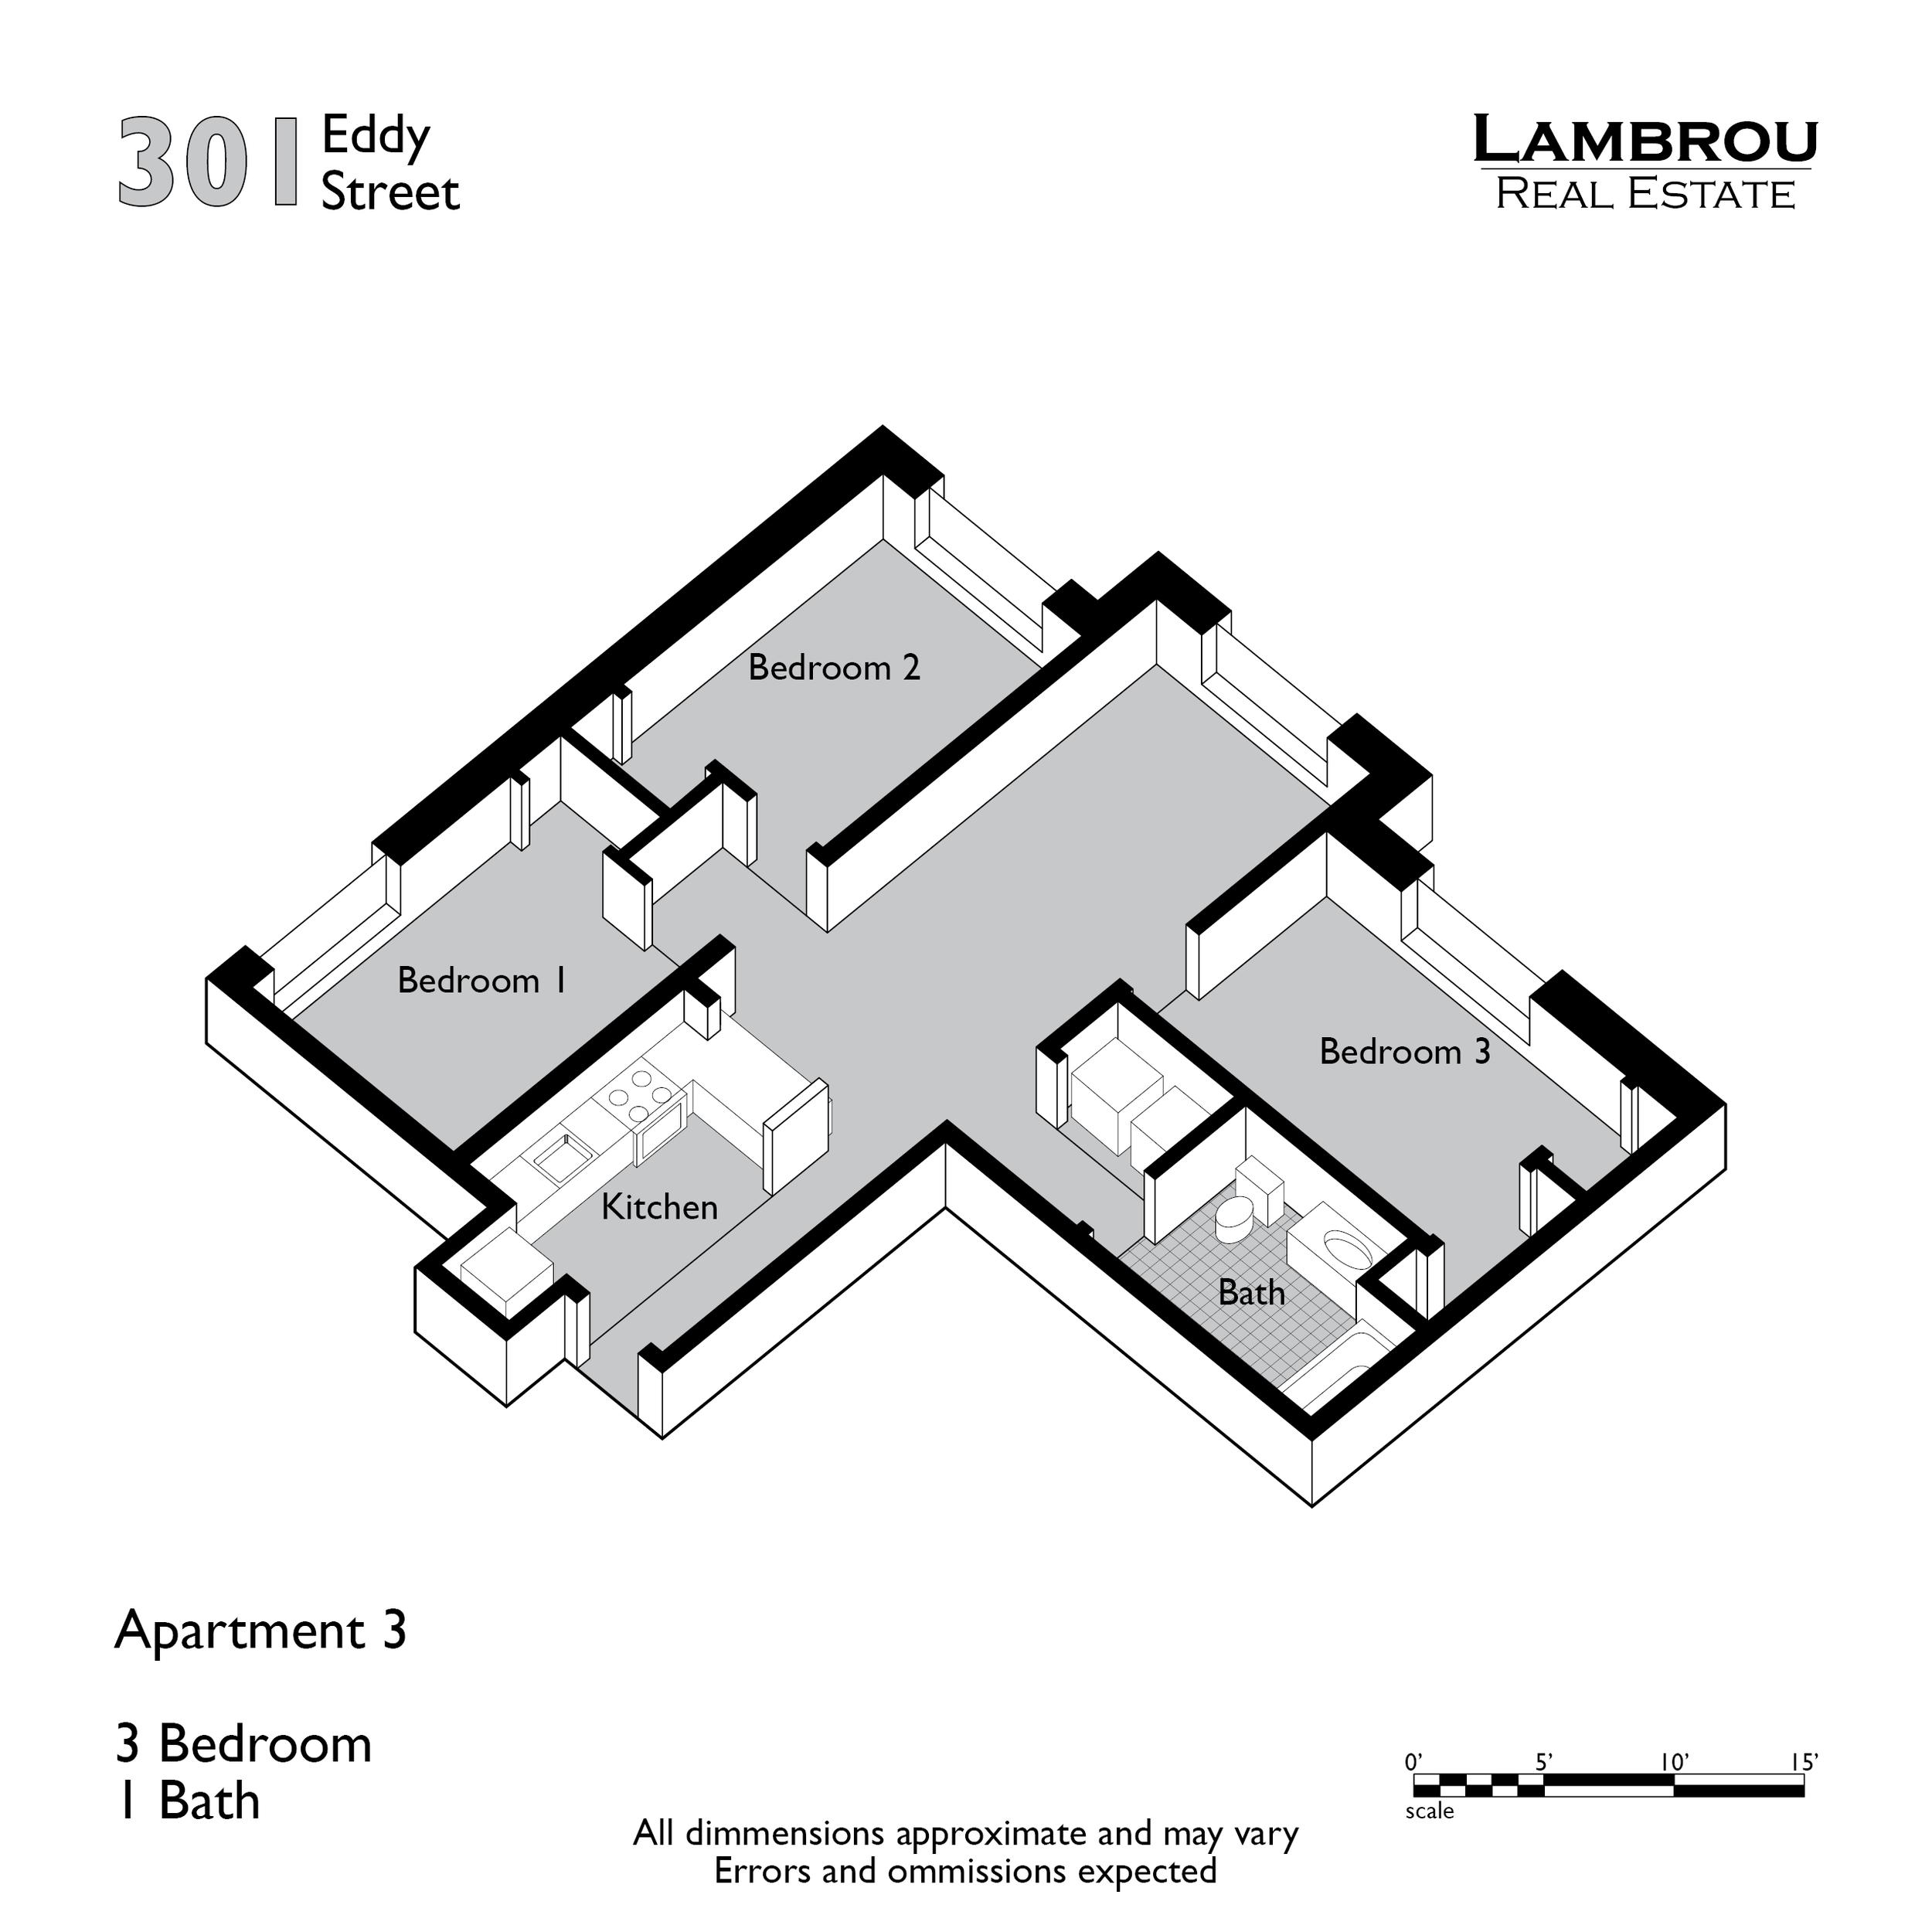 301 Eddy Street — Lambrou Real Estate